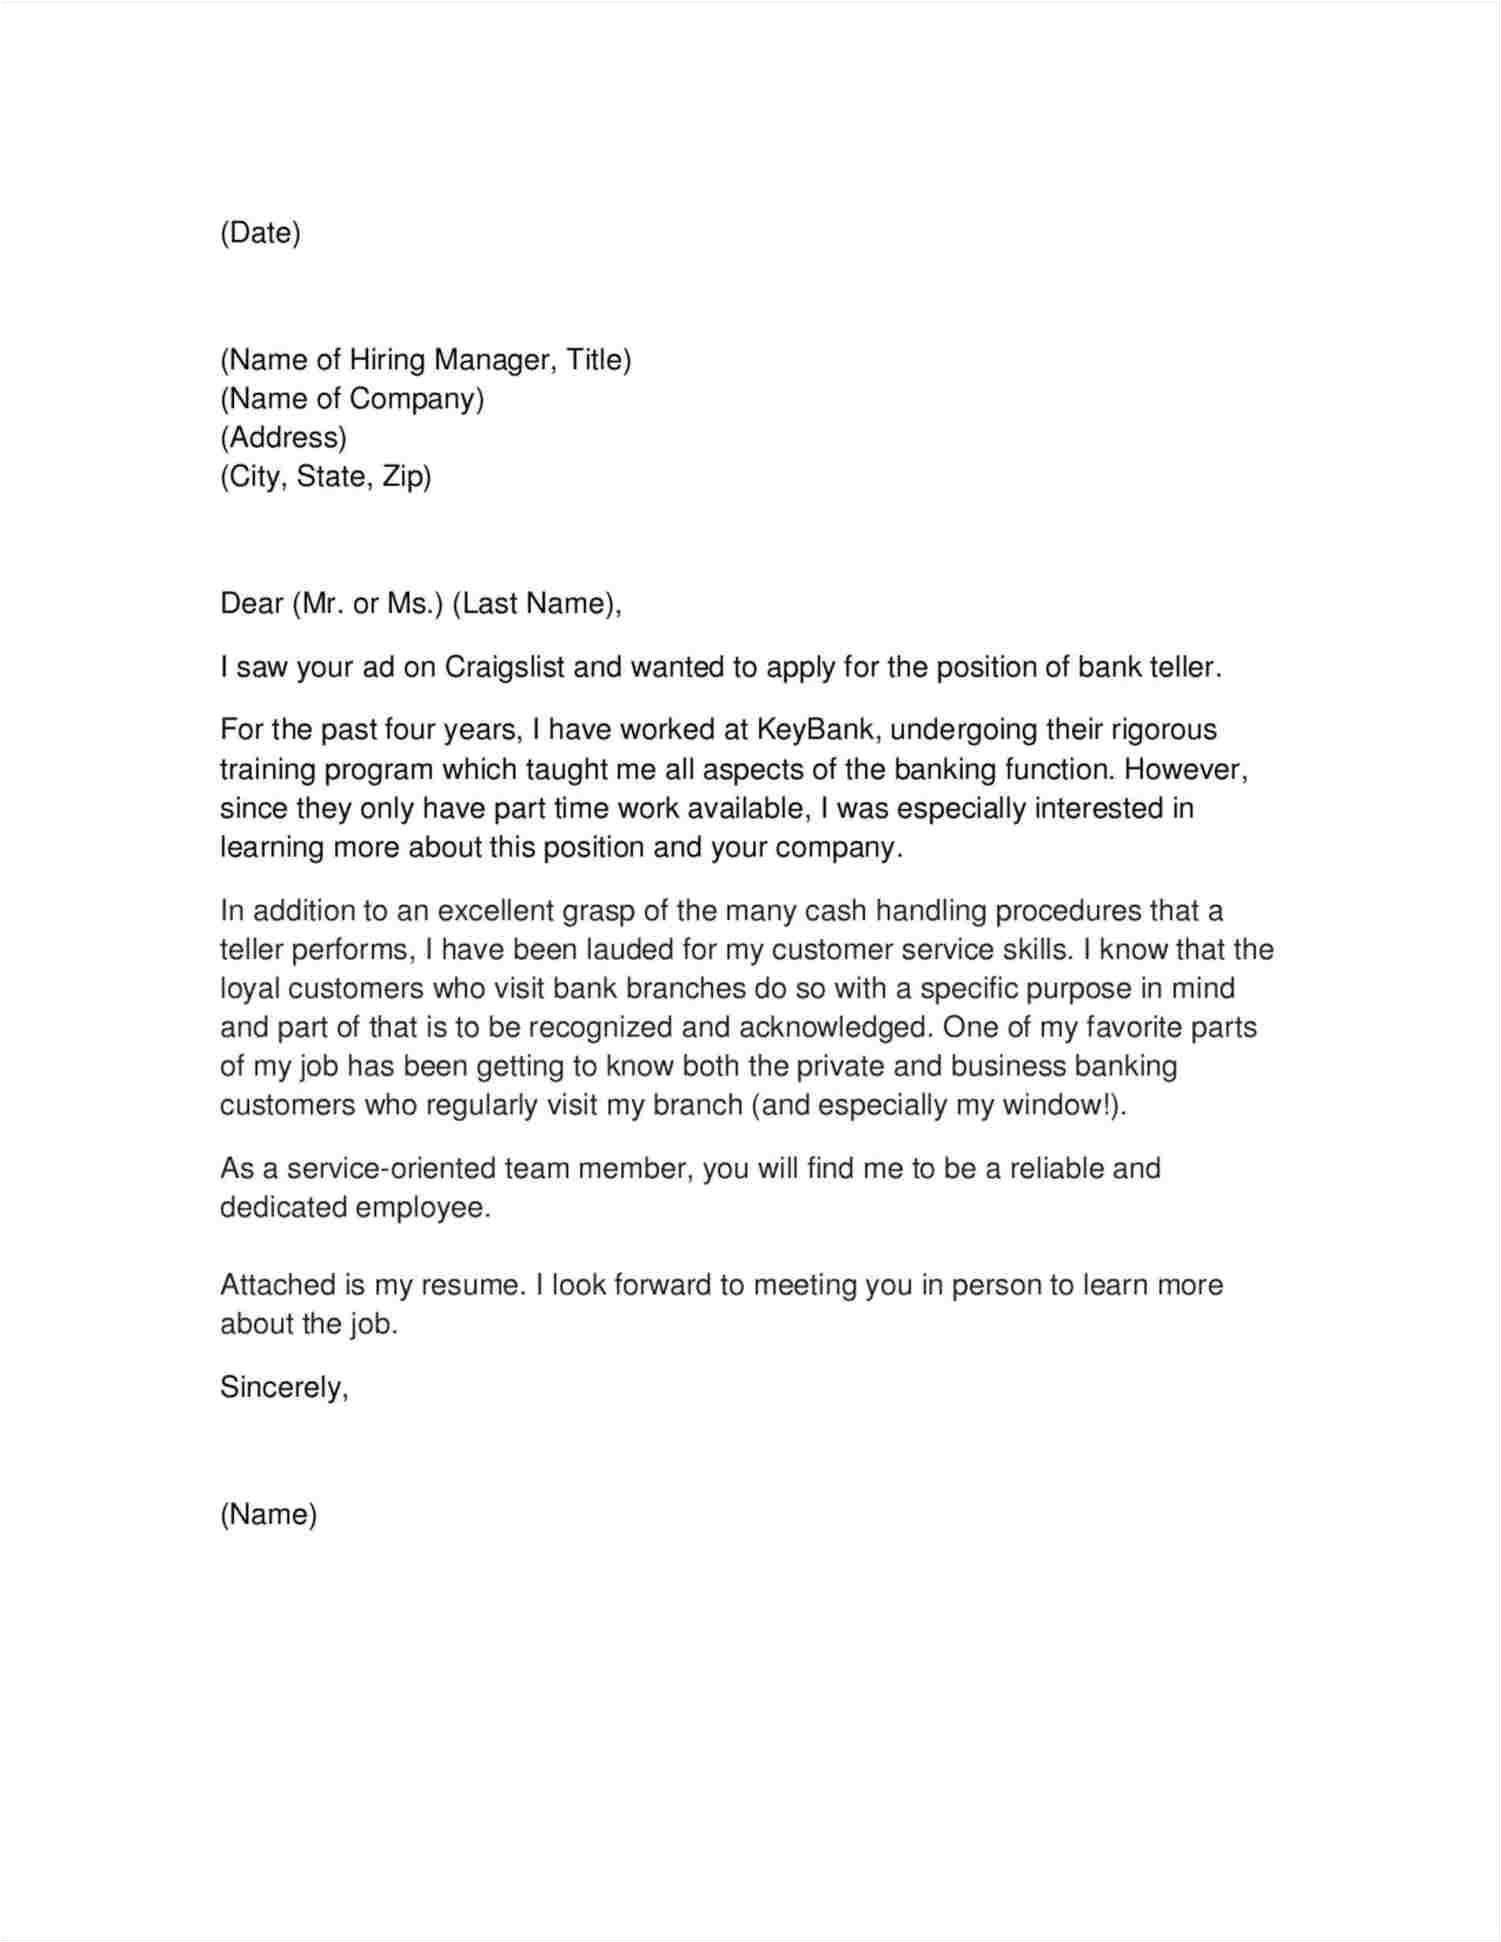 Sample Cover Letter for Teller Position with No Experience Sample Cover Letter for Teller Position with No Experience